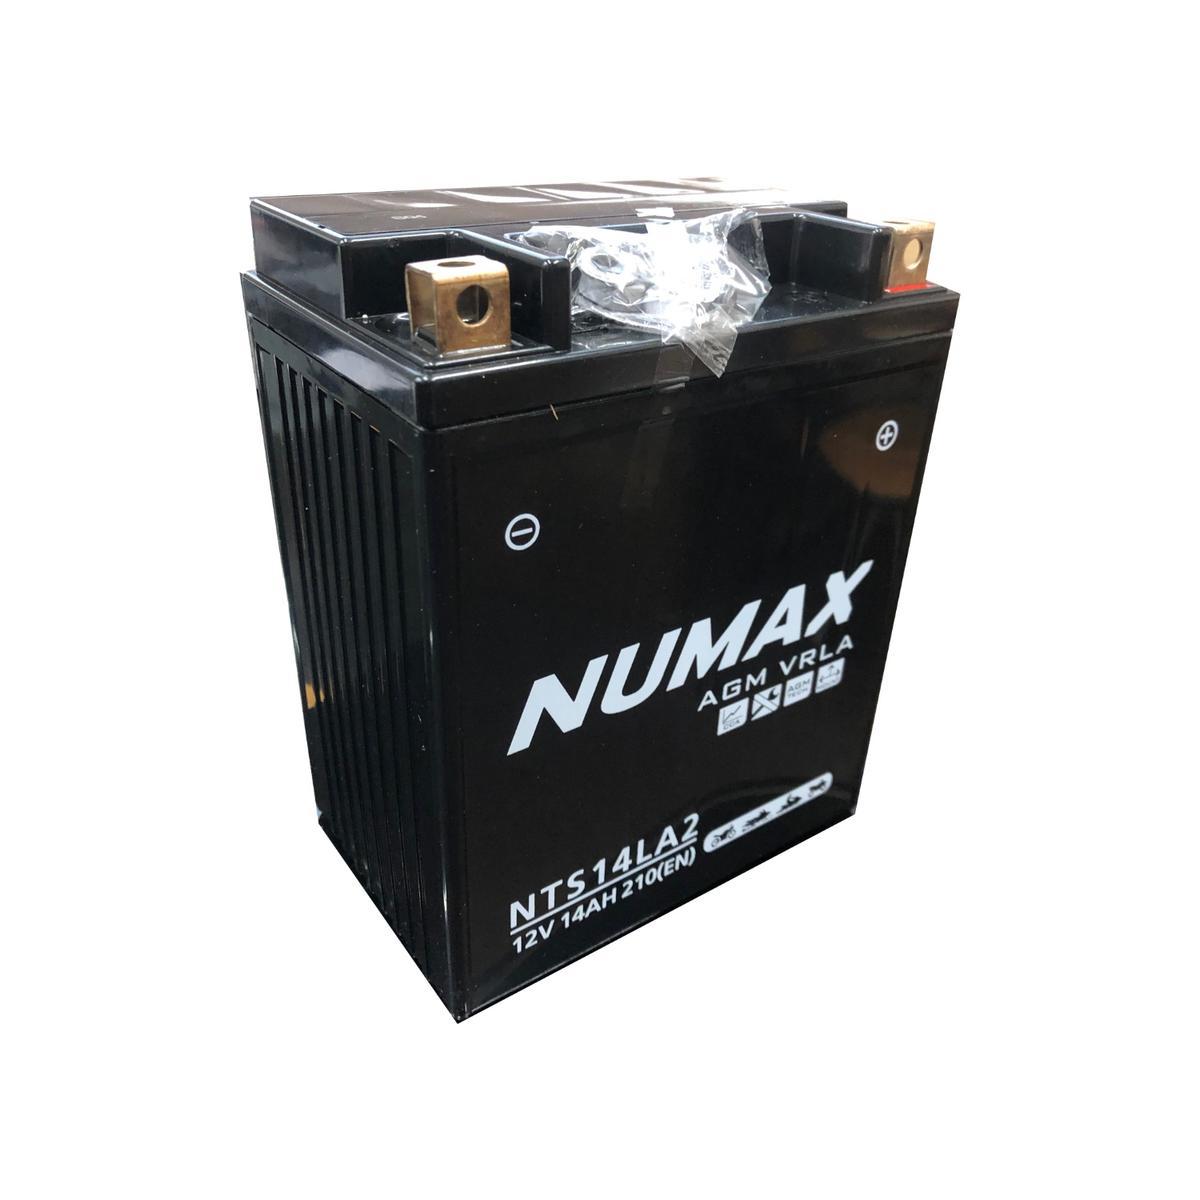 Numax NTS14LA2 Norton Commando 850 Motorbike Battery NEW